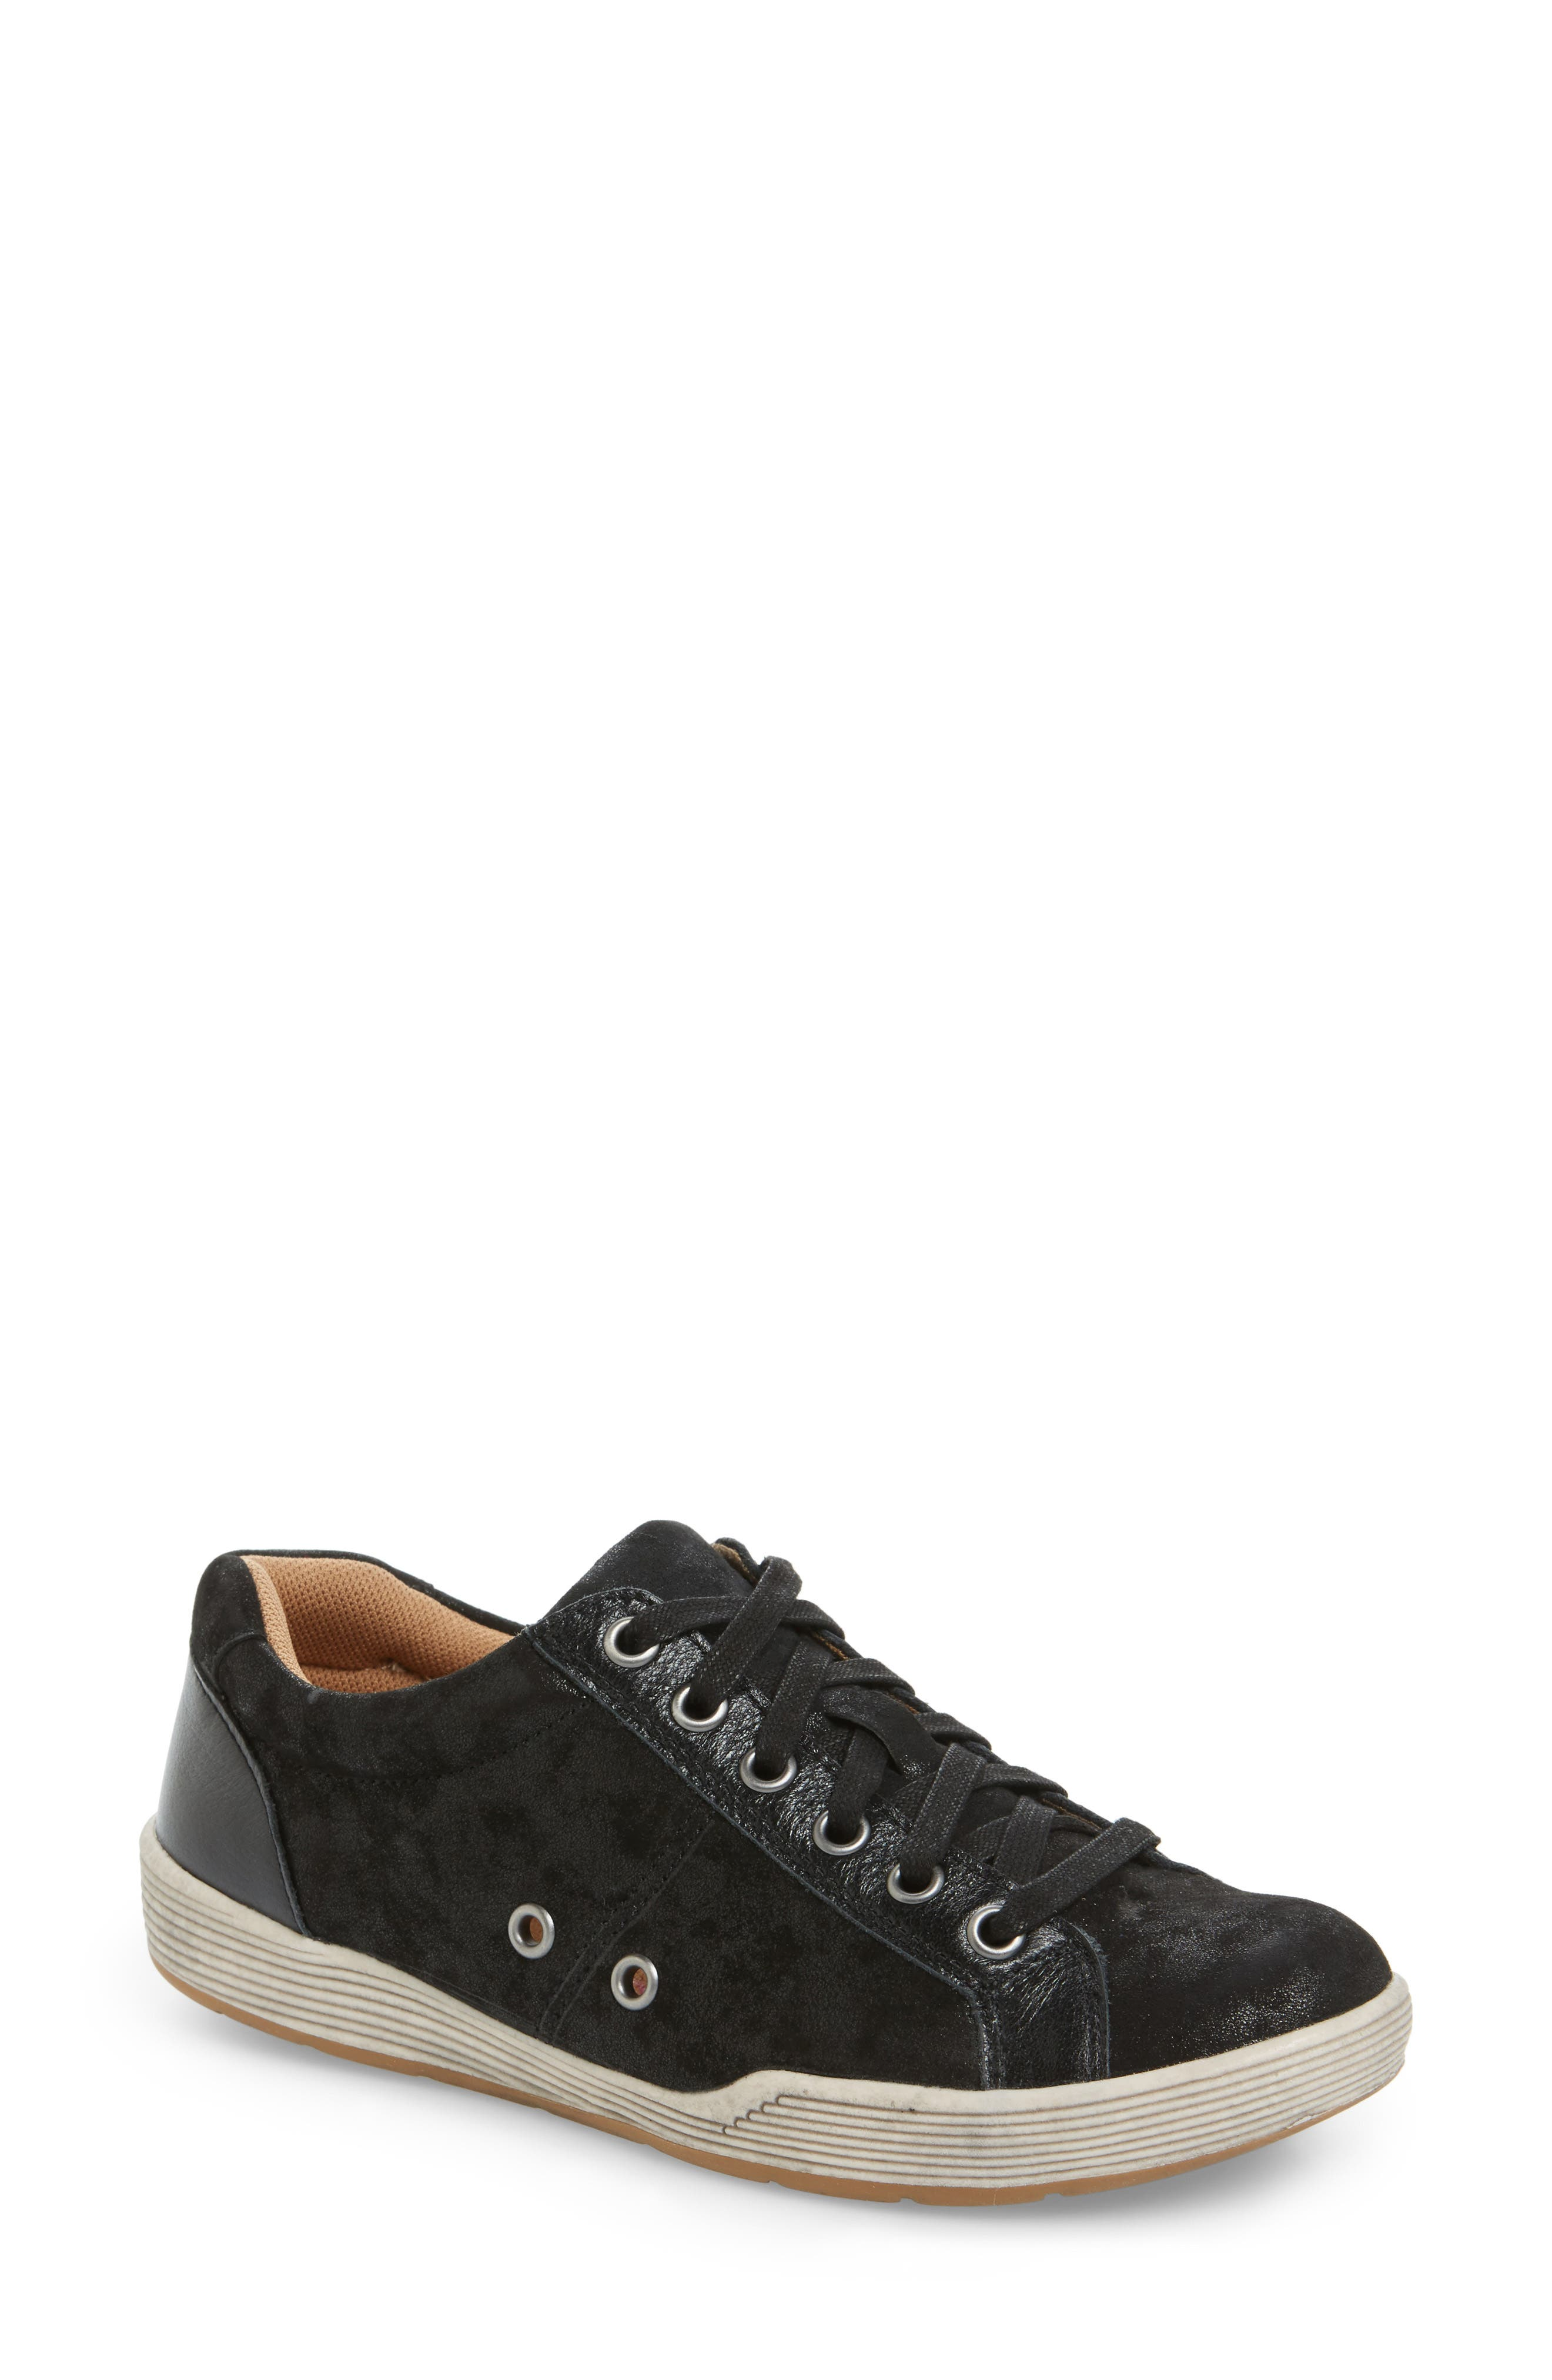 Lyons Low-Top Sneaker,                             Main thumbnail 1, color,                             BLACK SUEDE